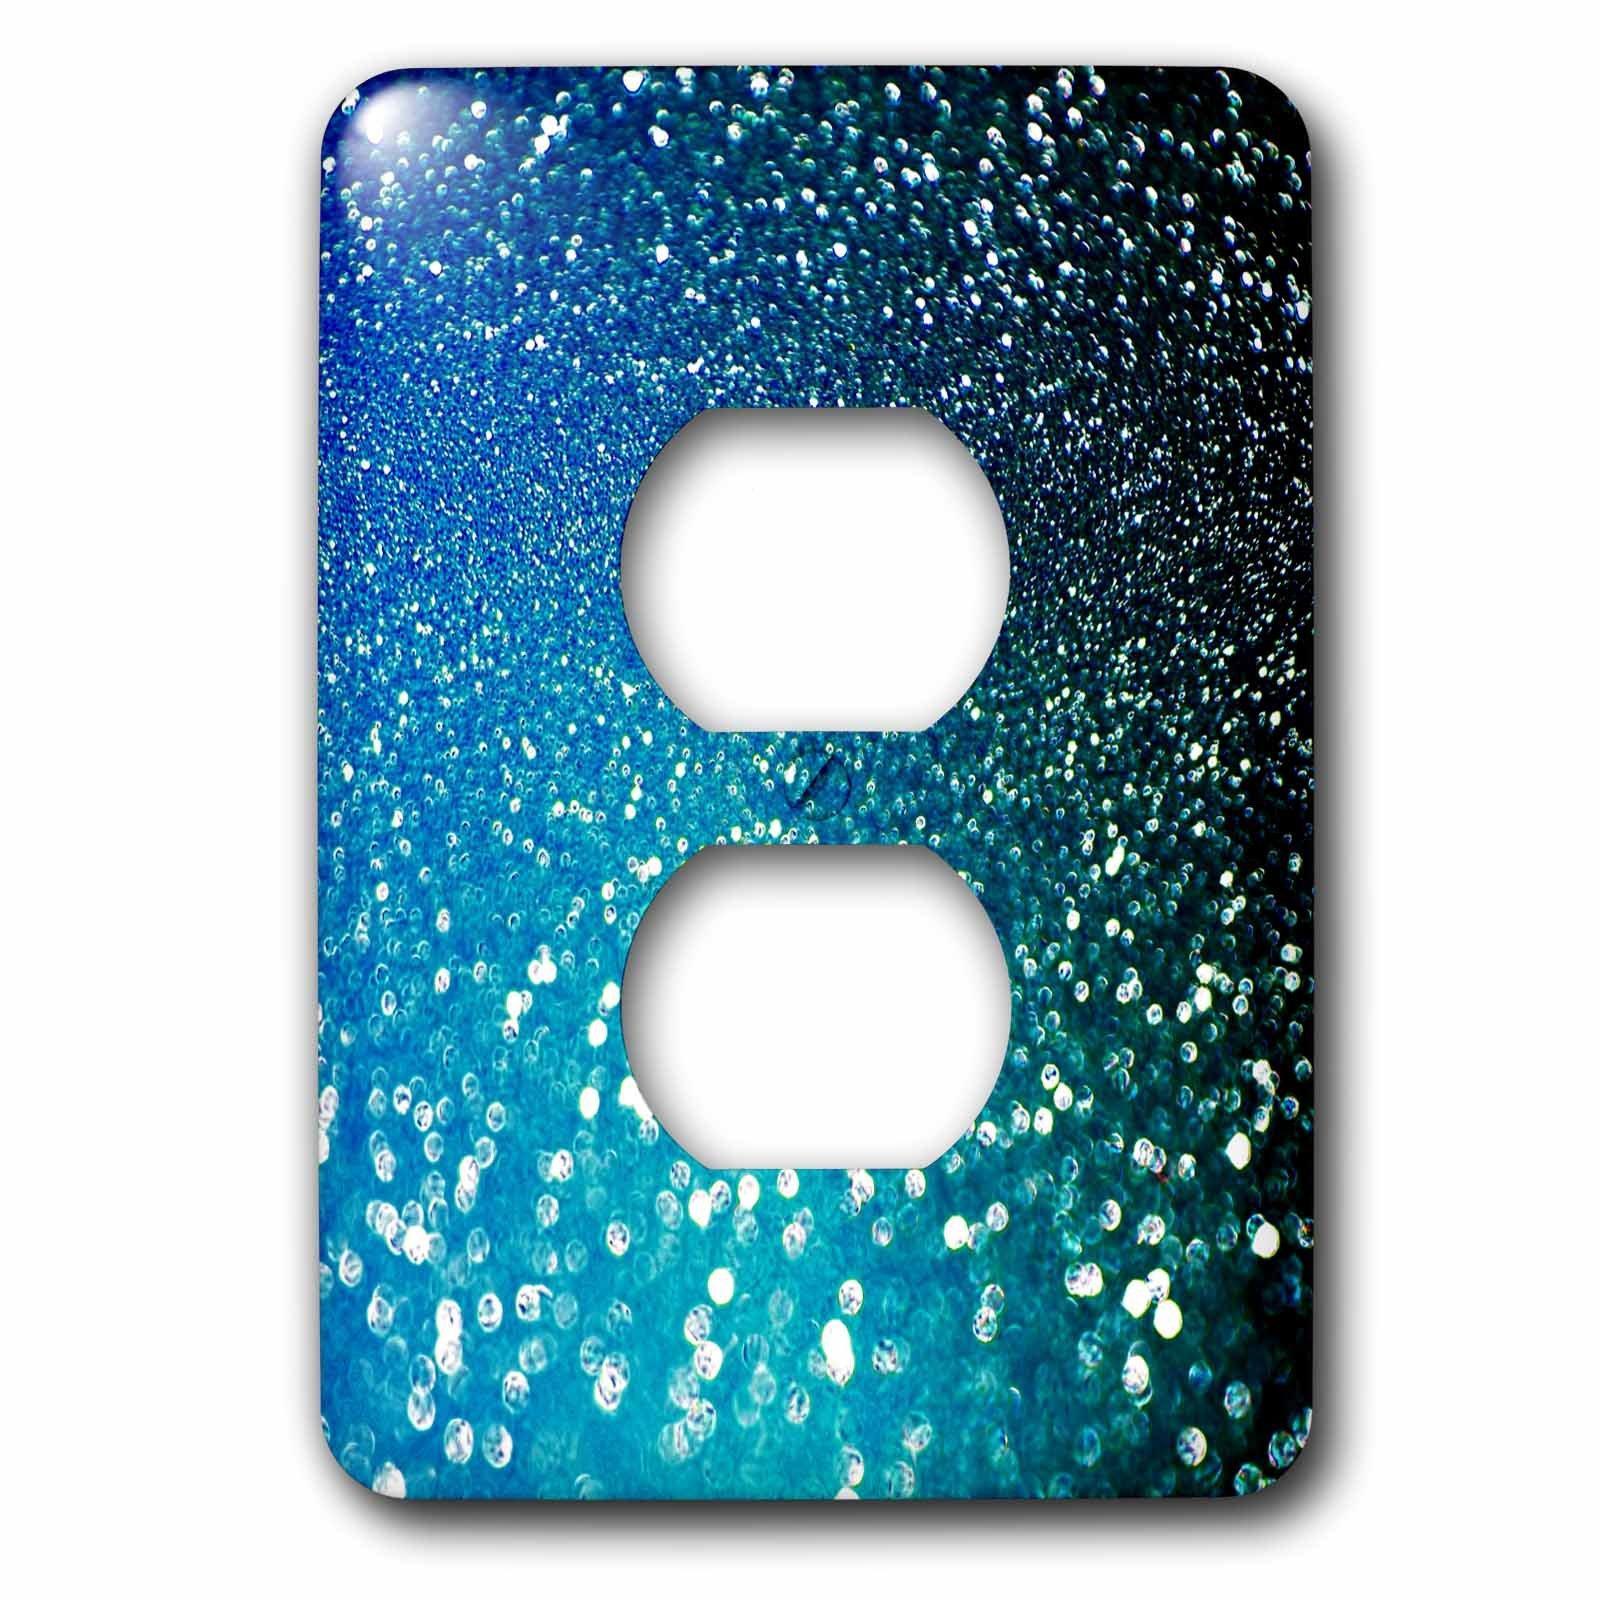 3dRose (lsp_266823_6) 2 Plug Outlet Cover (6) 2 Sparkling Ocean Blue Luxury Elegant Mermaid Glitter Effect Art Print by 3dRose (Image #1)